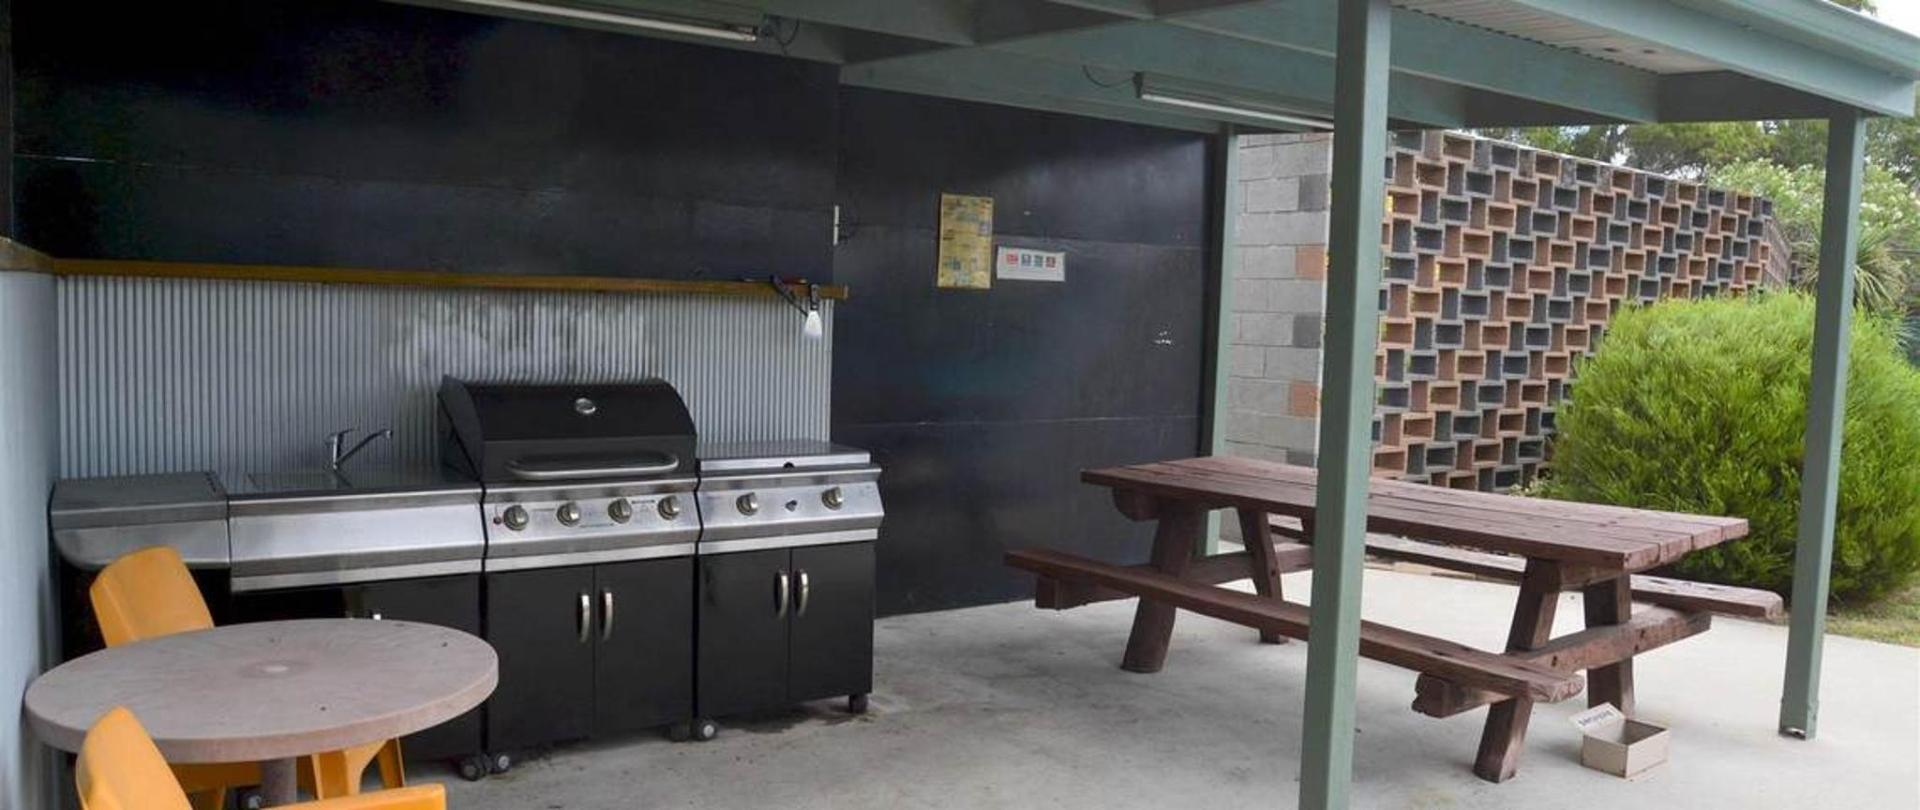 BBQ Facilities.jpg